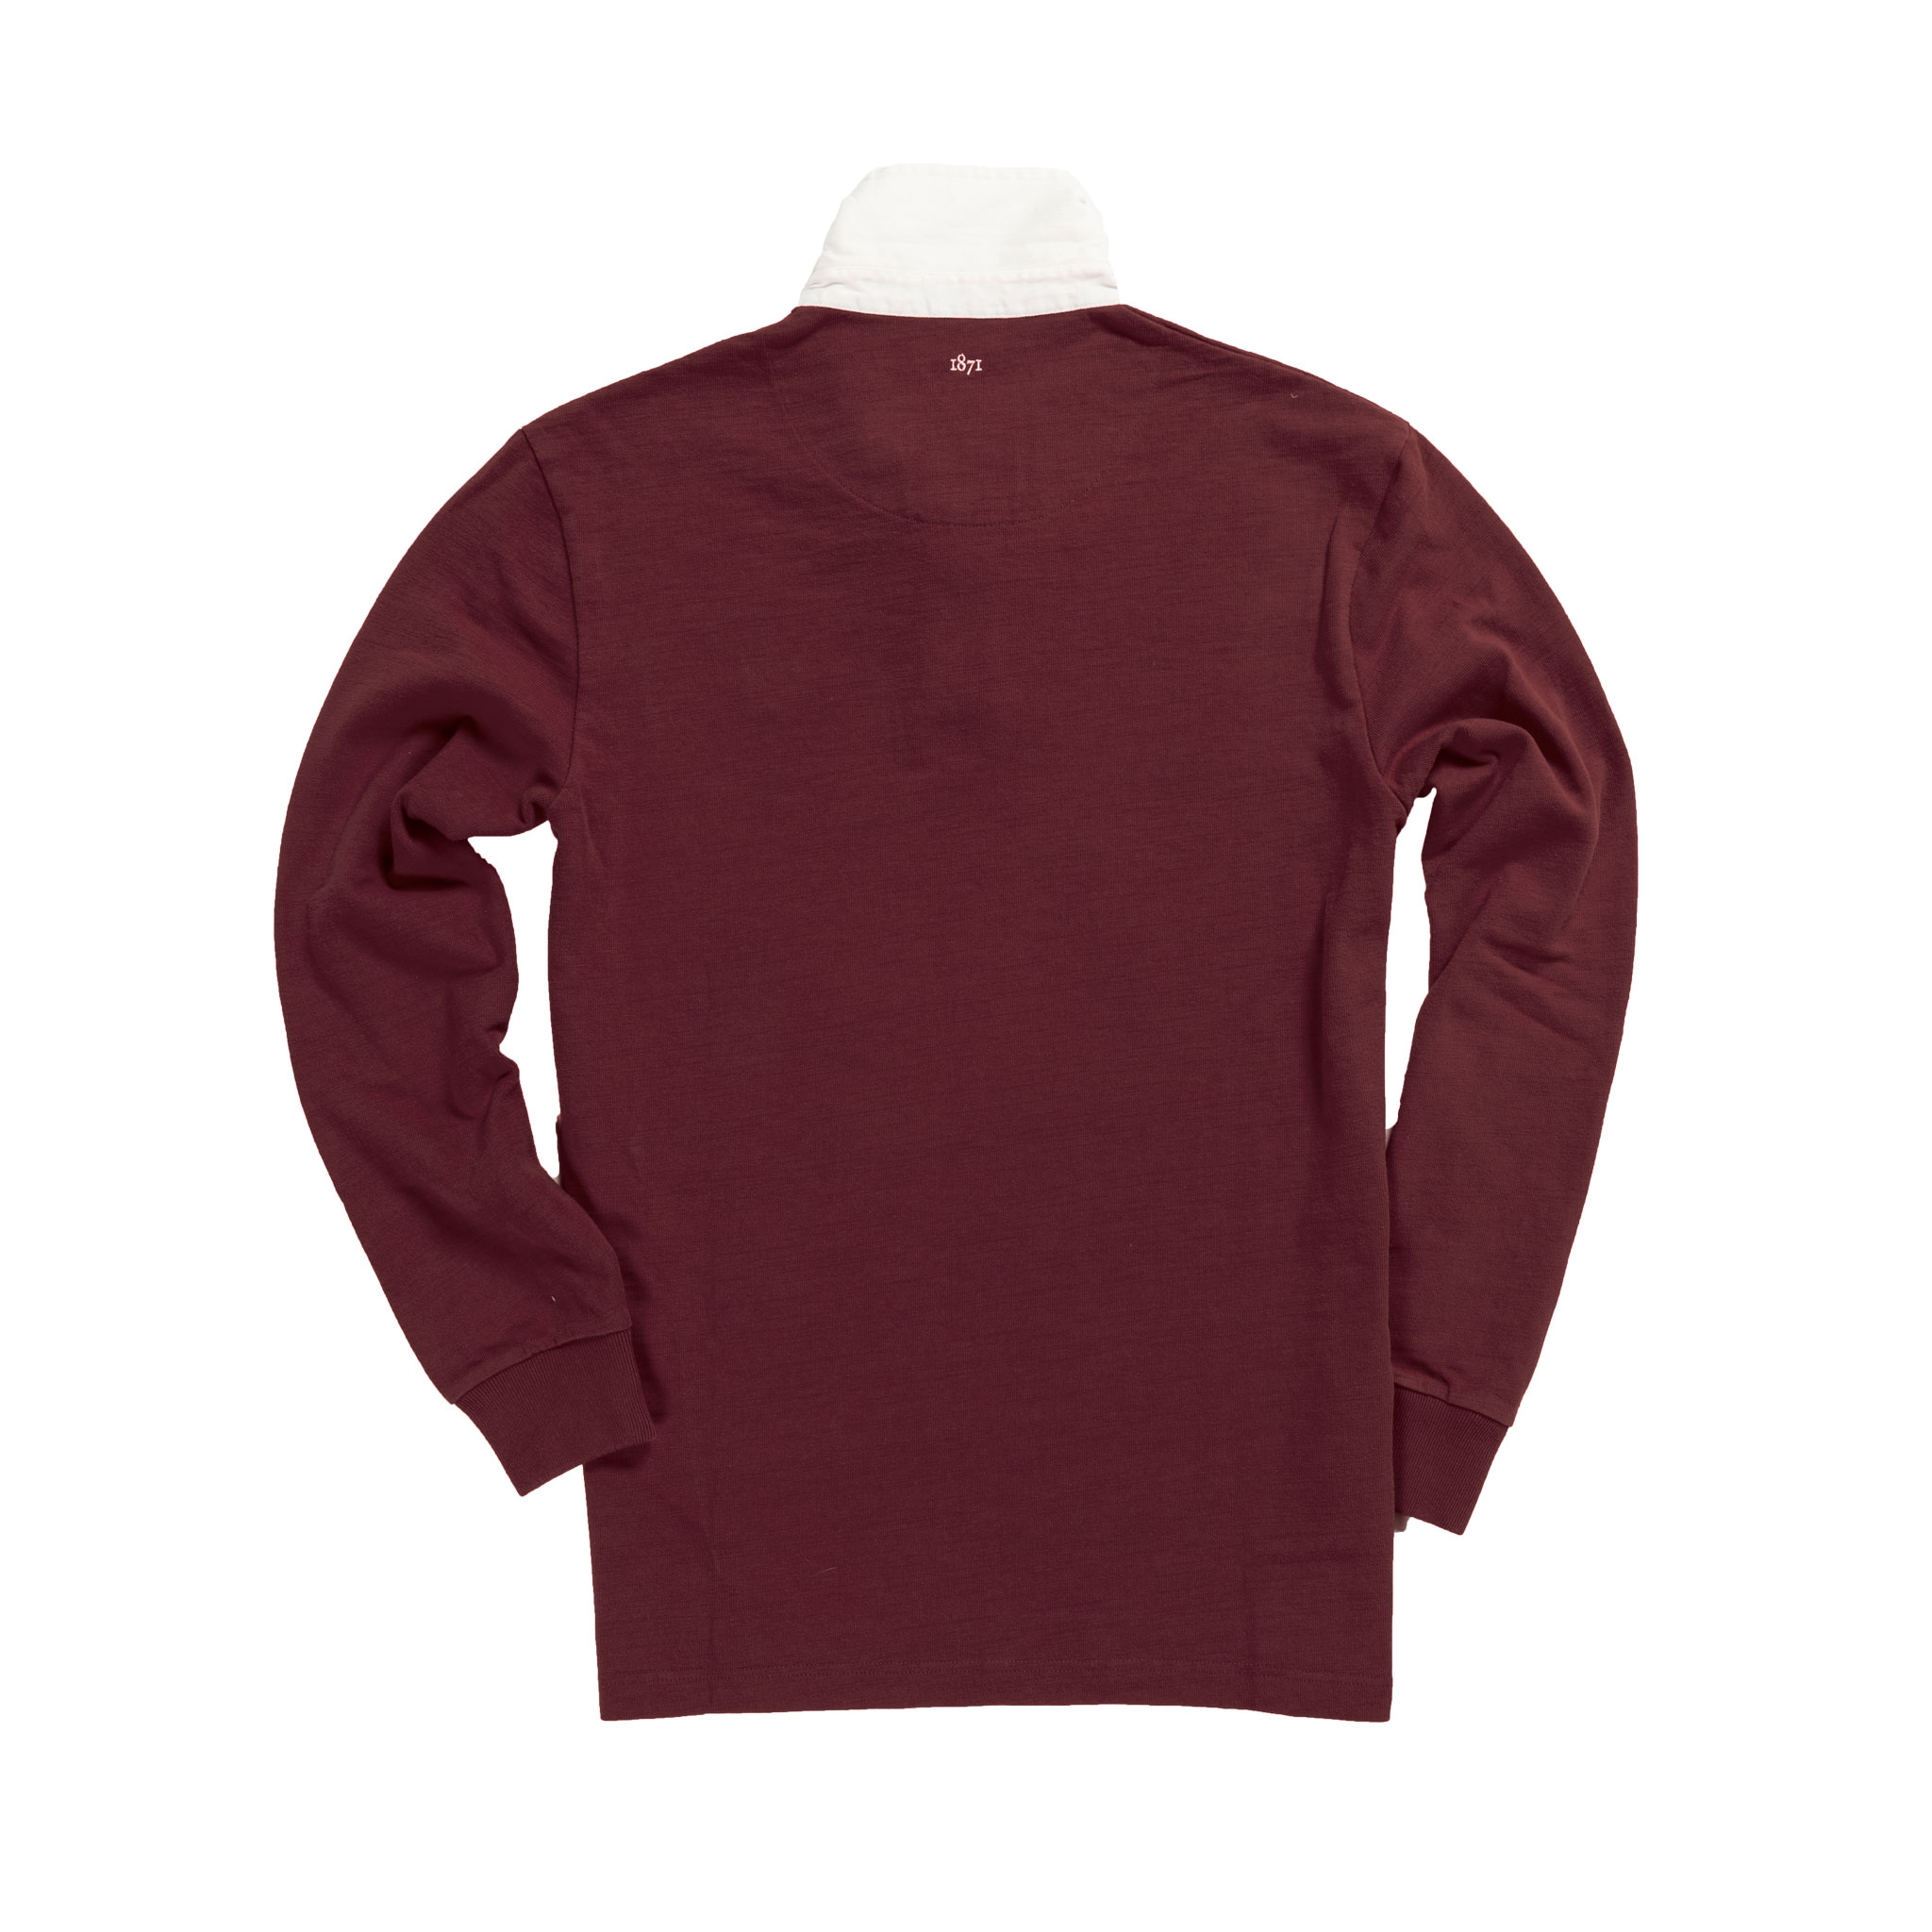 Glebe Dirty Reds 1908 Rugby Shirt_Back